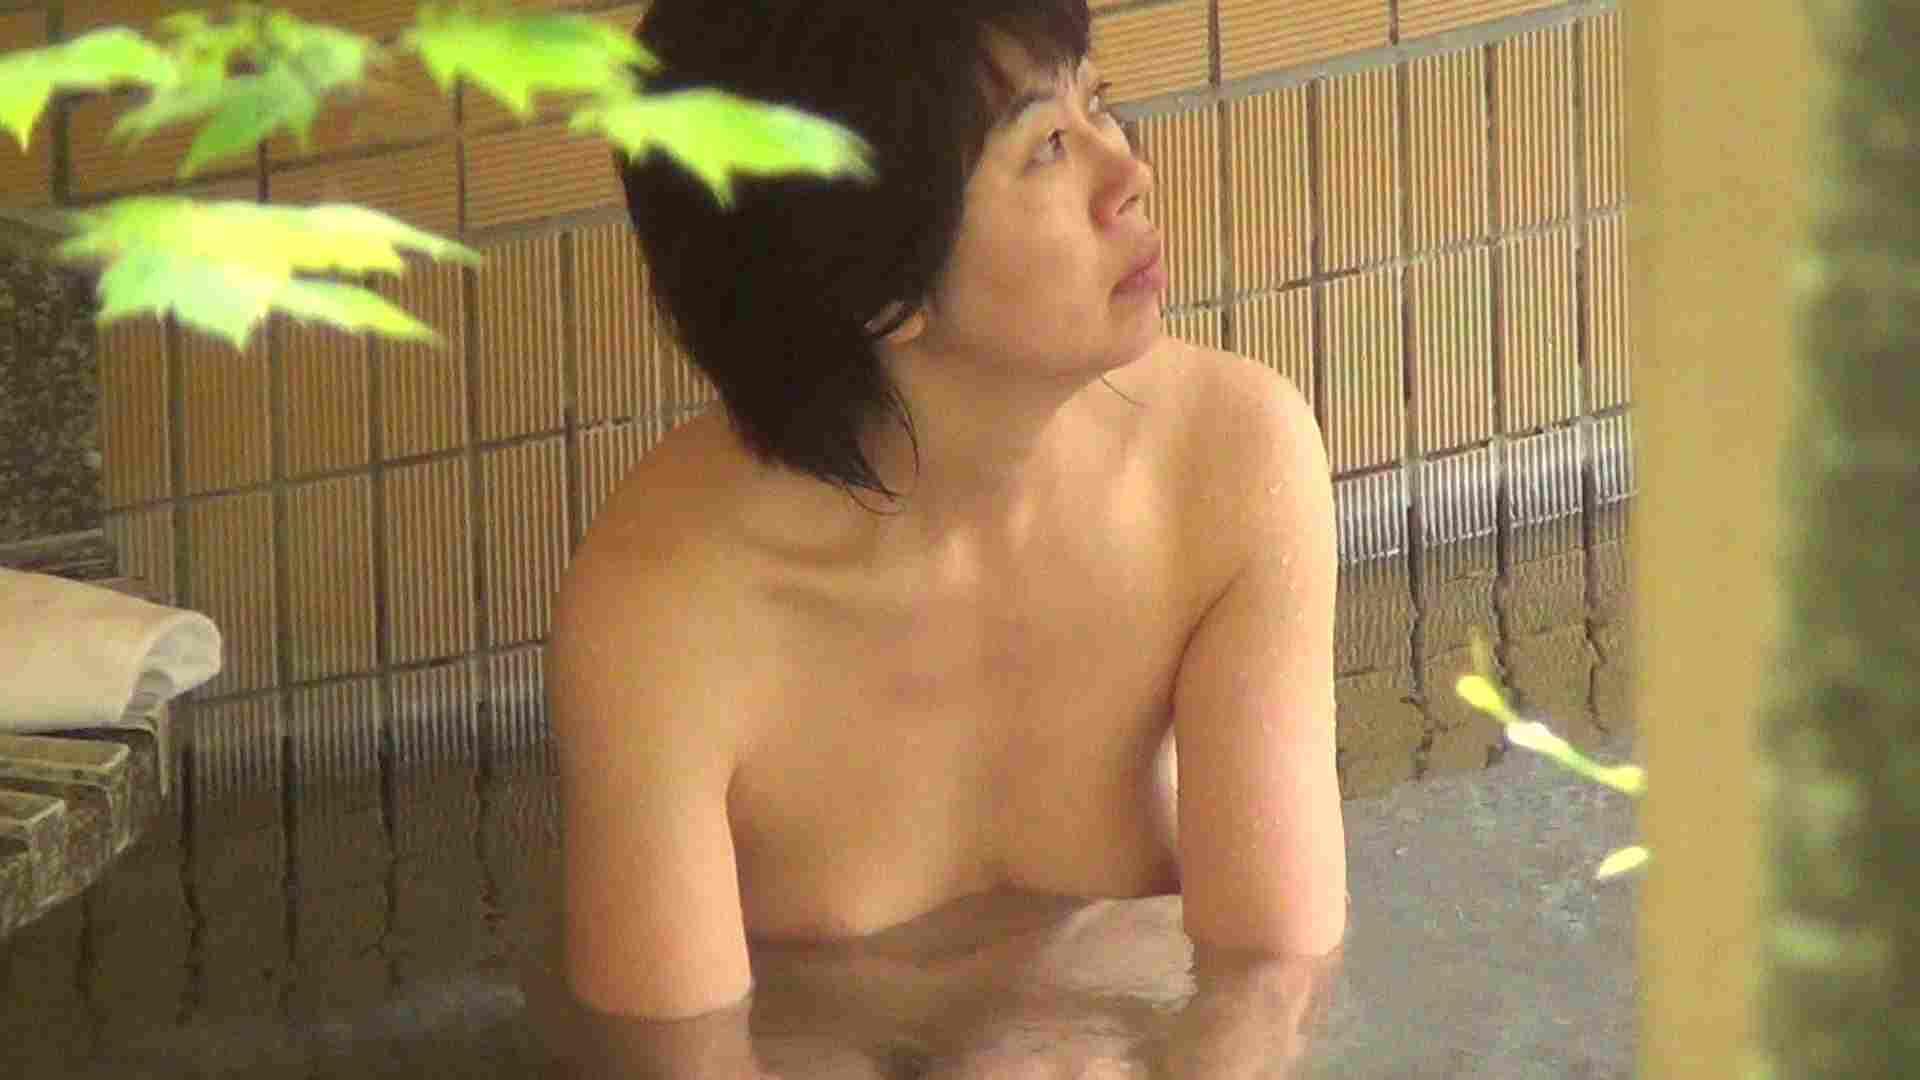 Aquaな露天風呂Vol.247 盗撮 AV無料 82枚 35